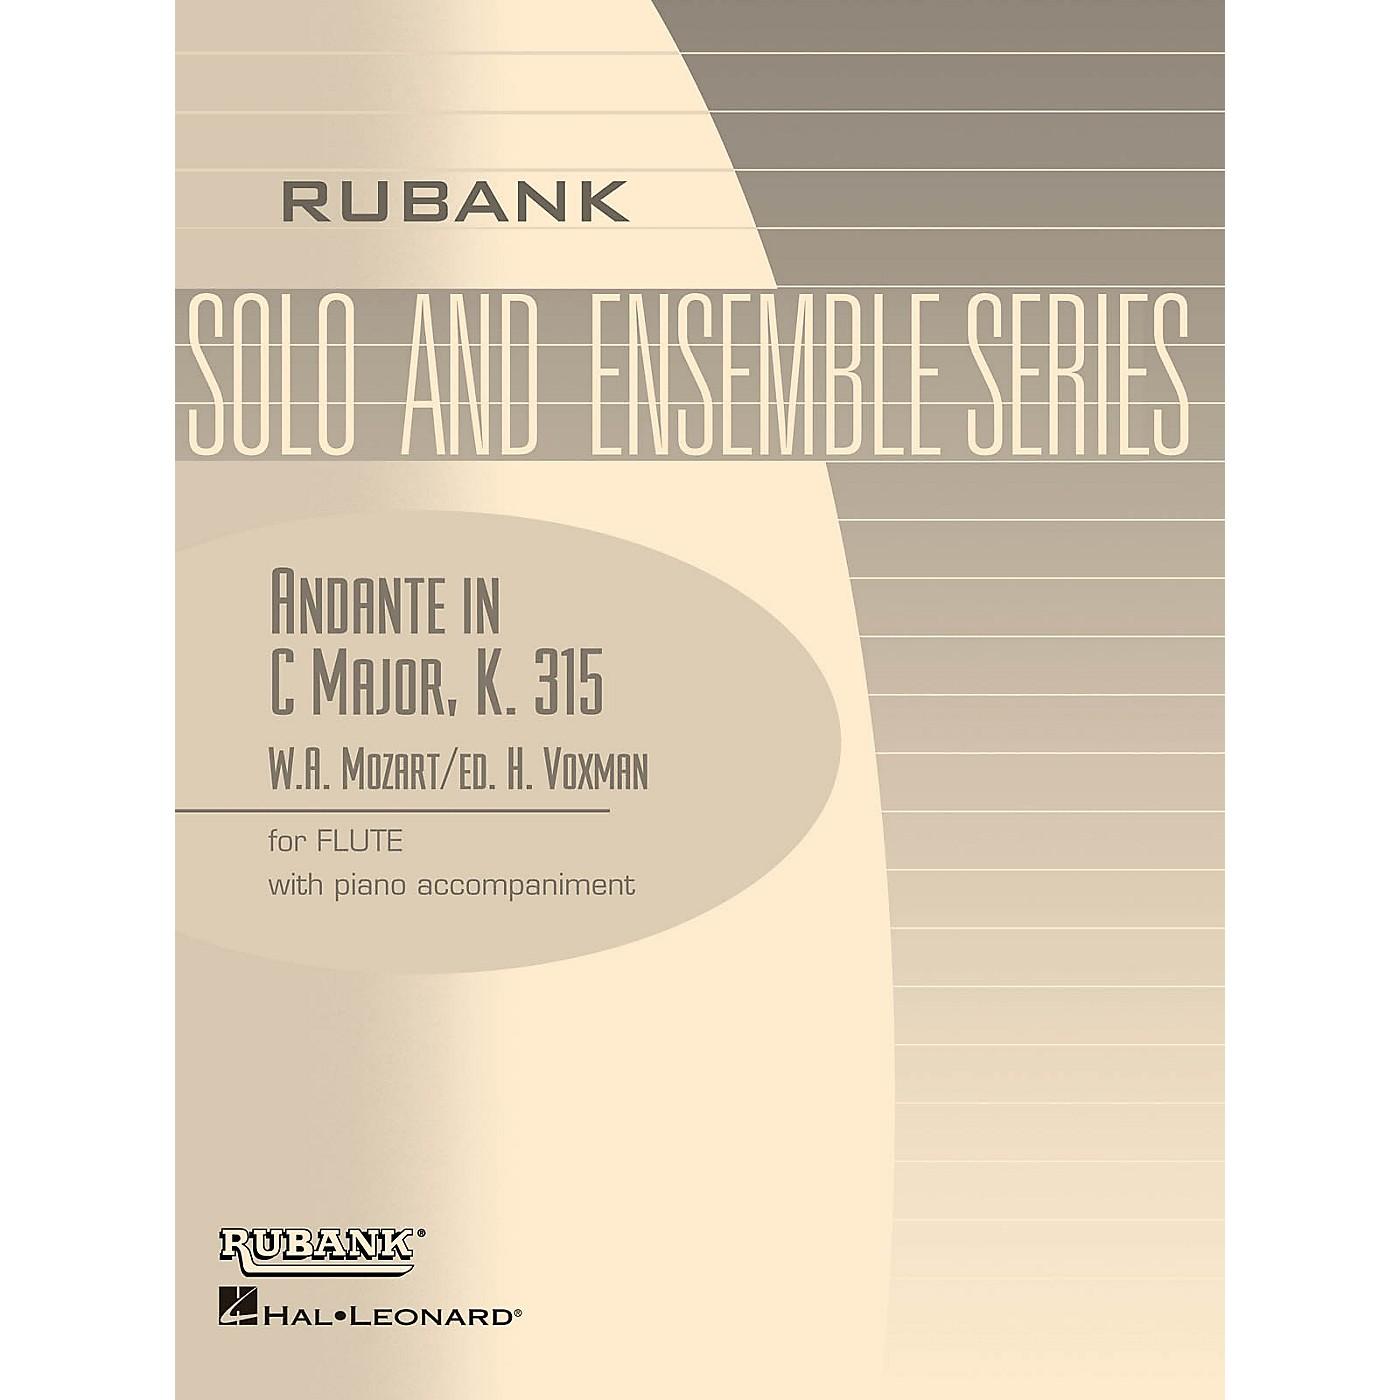 Rubank Publications Andante in C Major, K. 315 (Flute Solo with Piano - Grade 4) Rubank Solo/Ensemble Sheet Series thumbnail